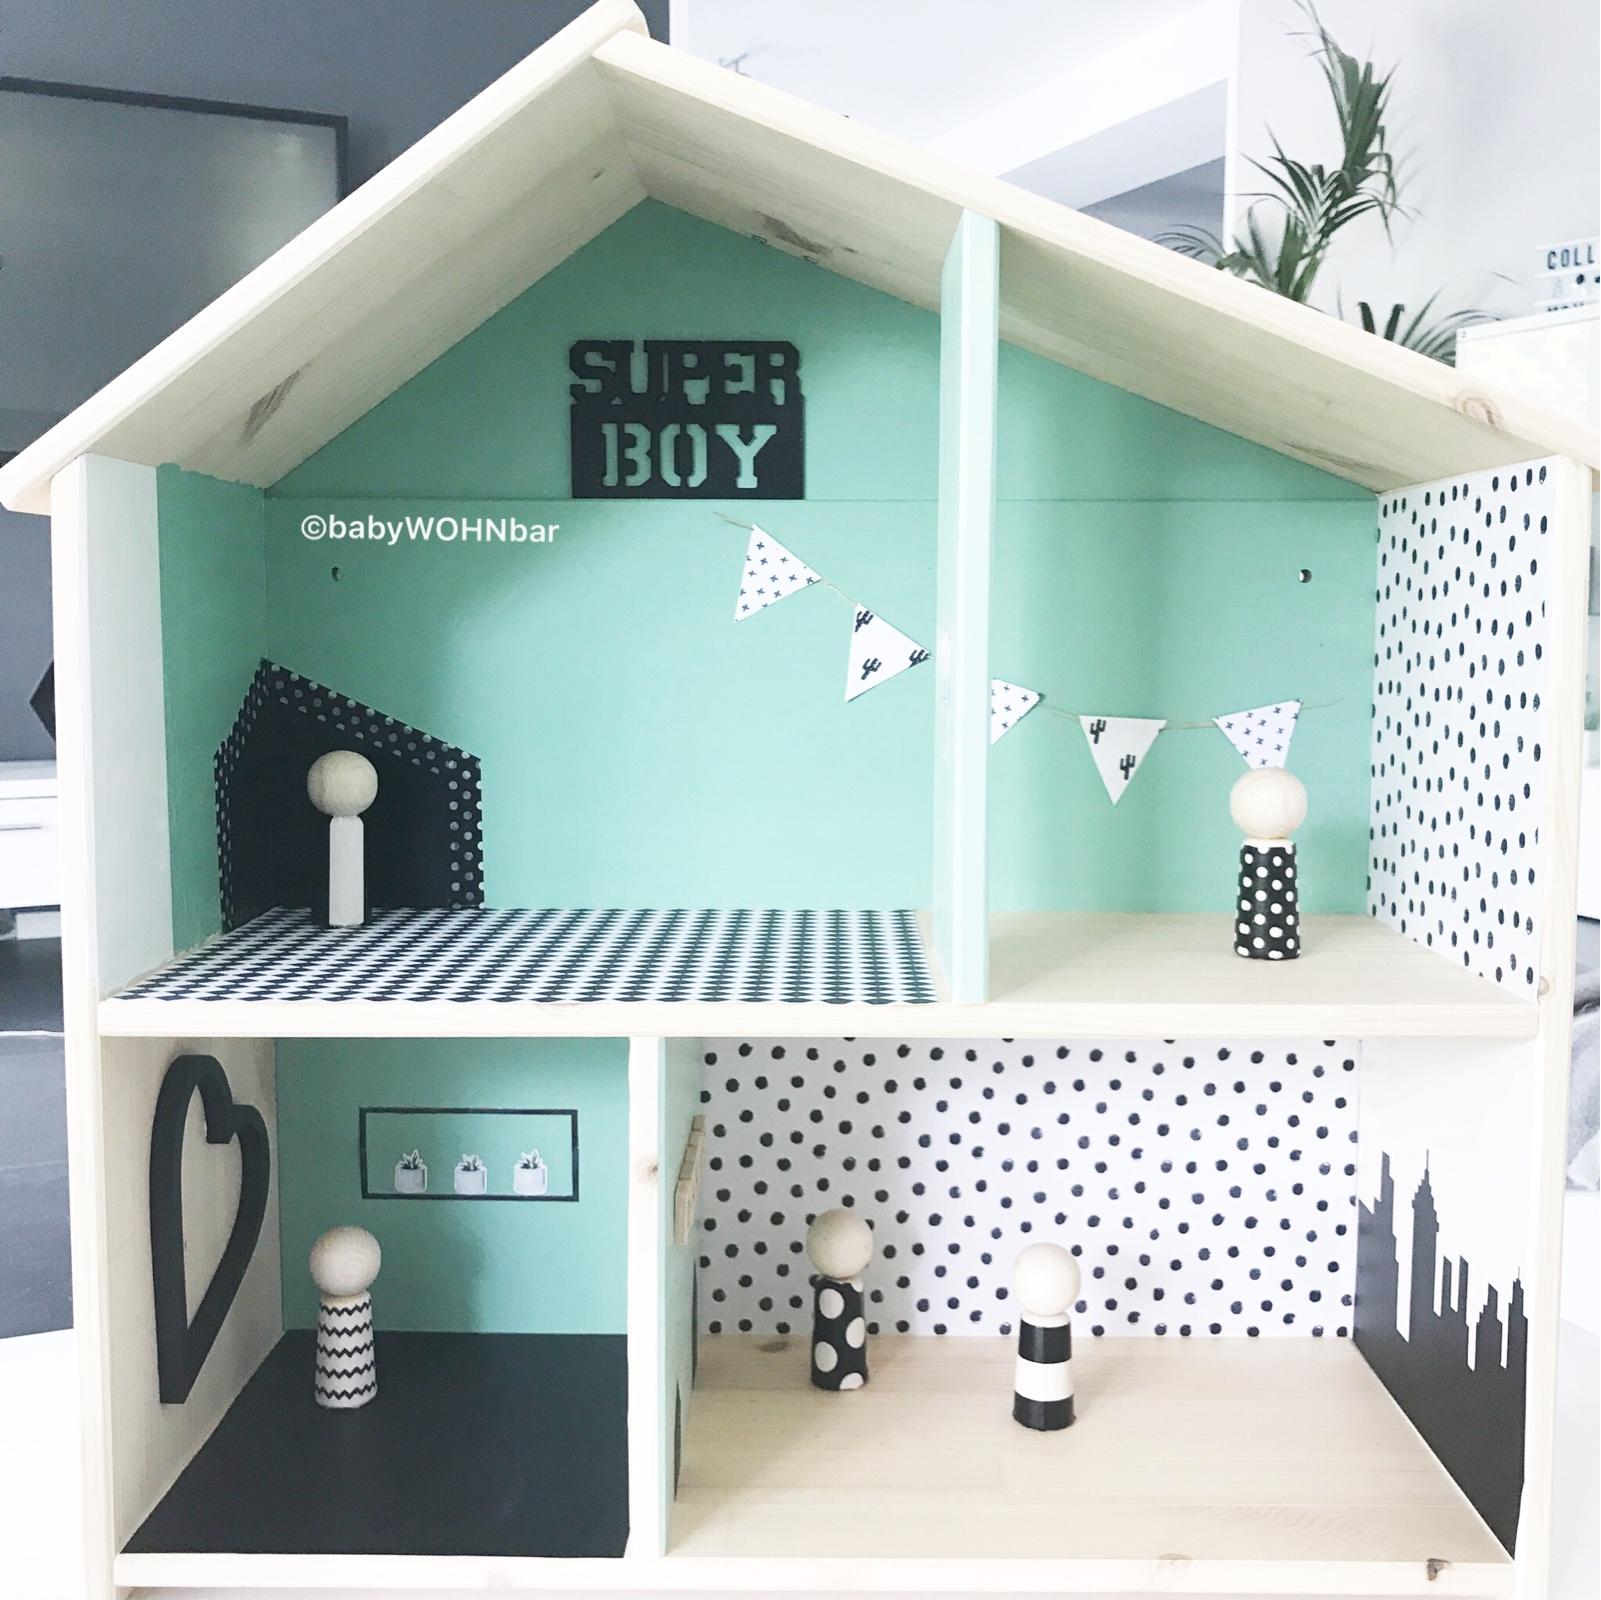 Kidroom Diy Ikea Puppenhaus Flisat Hack Babywohnbar